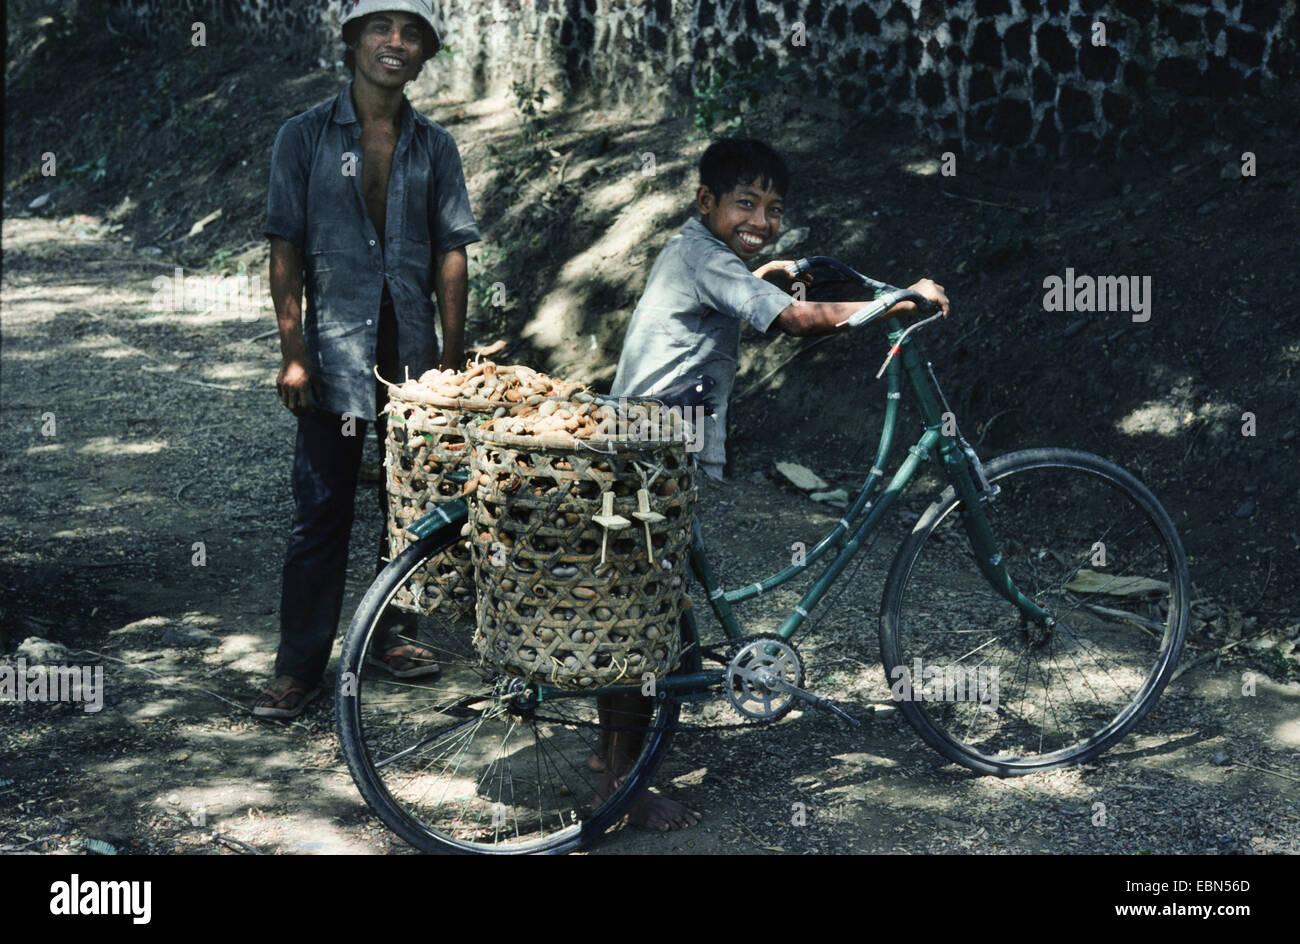 tamarind (Tamarindus indica), child carrying fruits of tamarid by bike, Indonesia, Bali - Stock Image